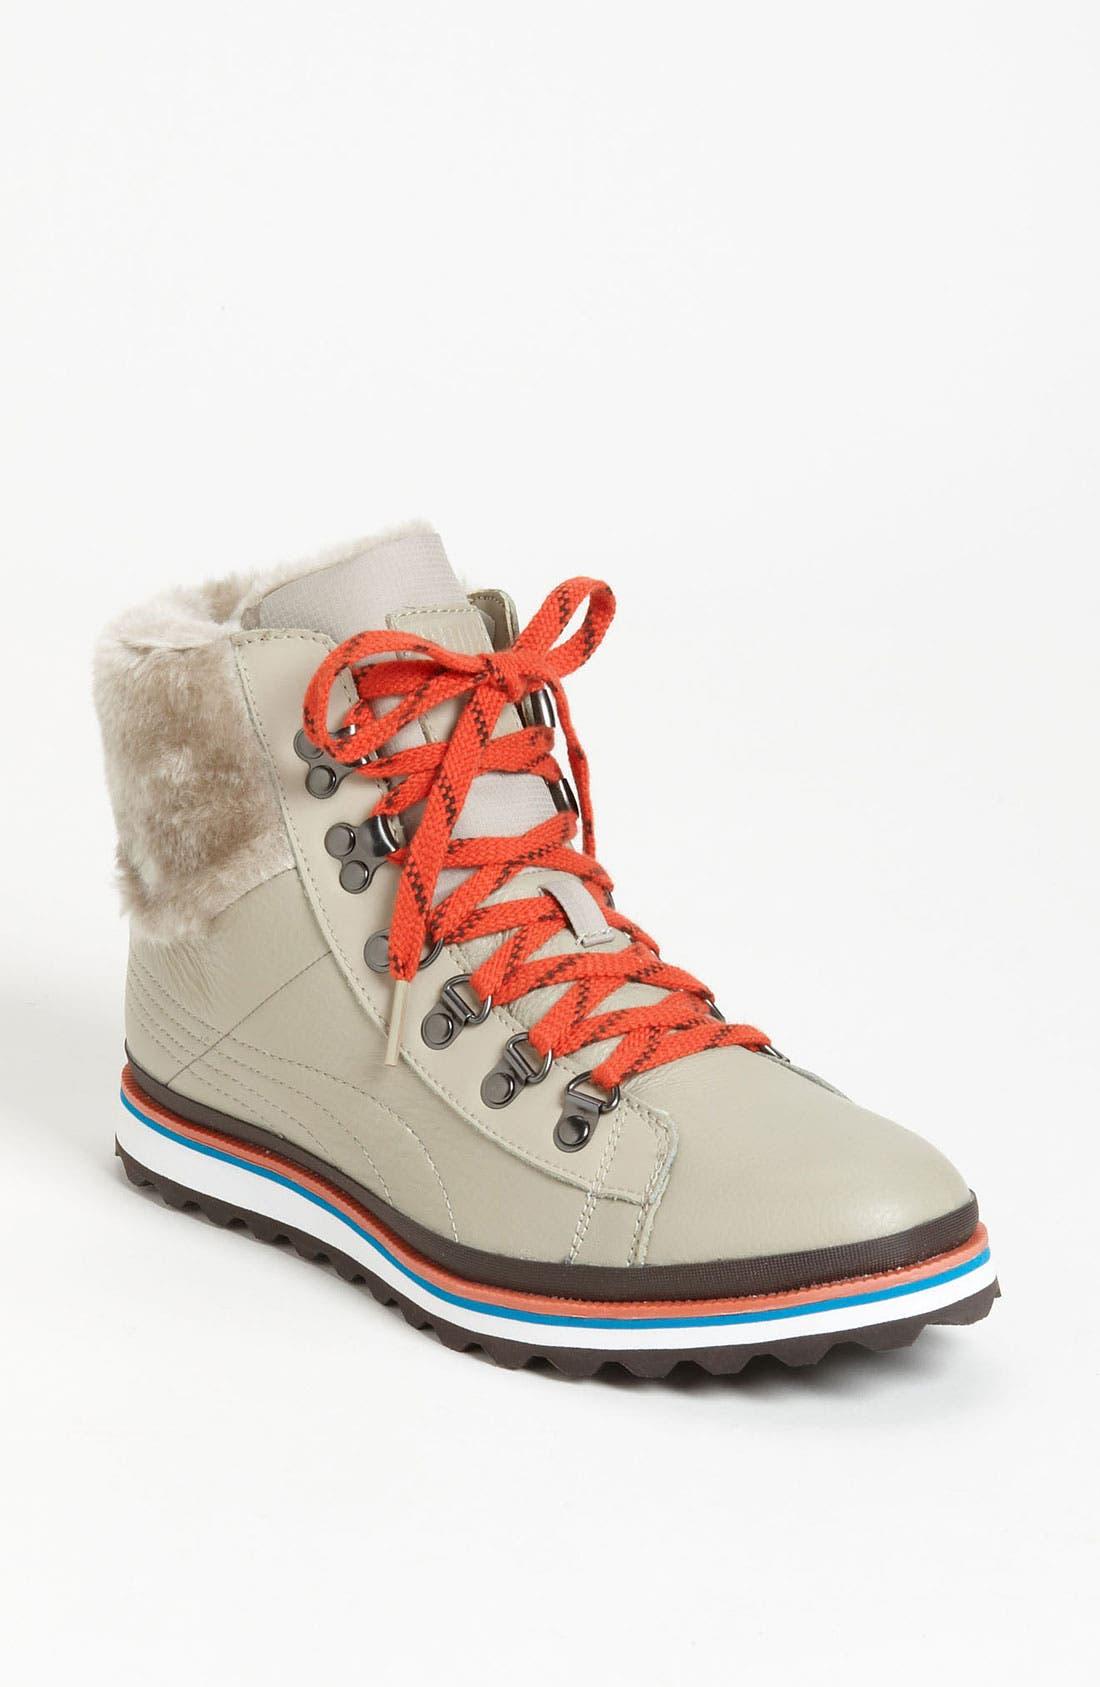 Main Image - PUMA 'City' Snow Boot